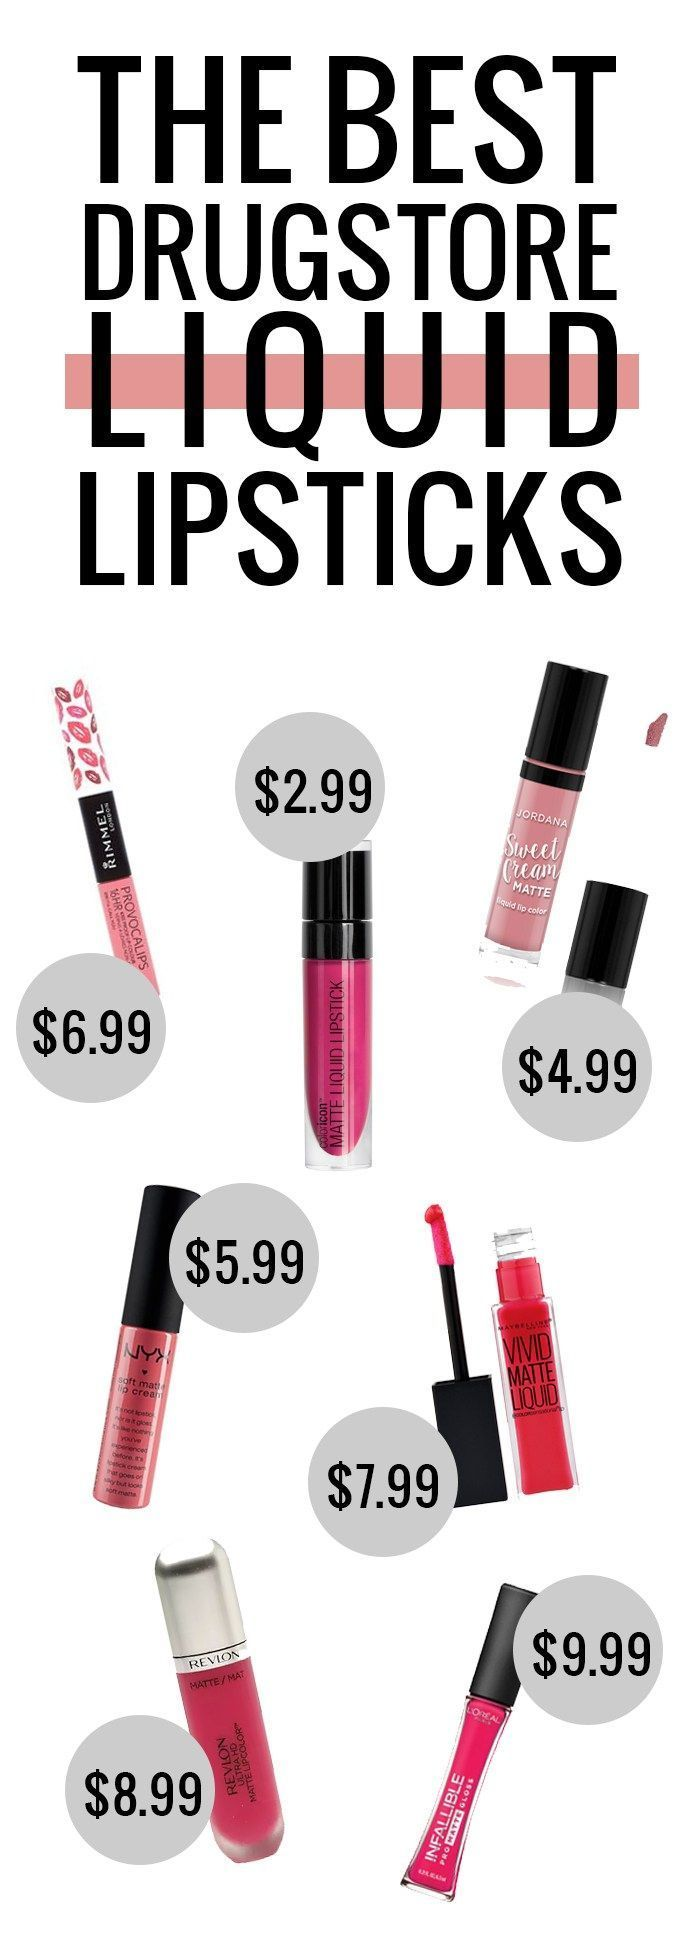 The Best Drugstore Liquid Lipsticks